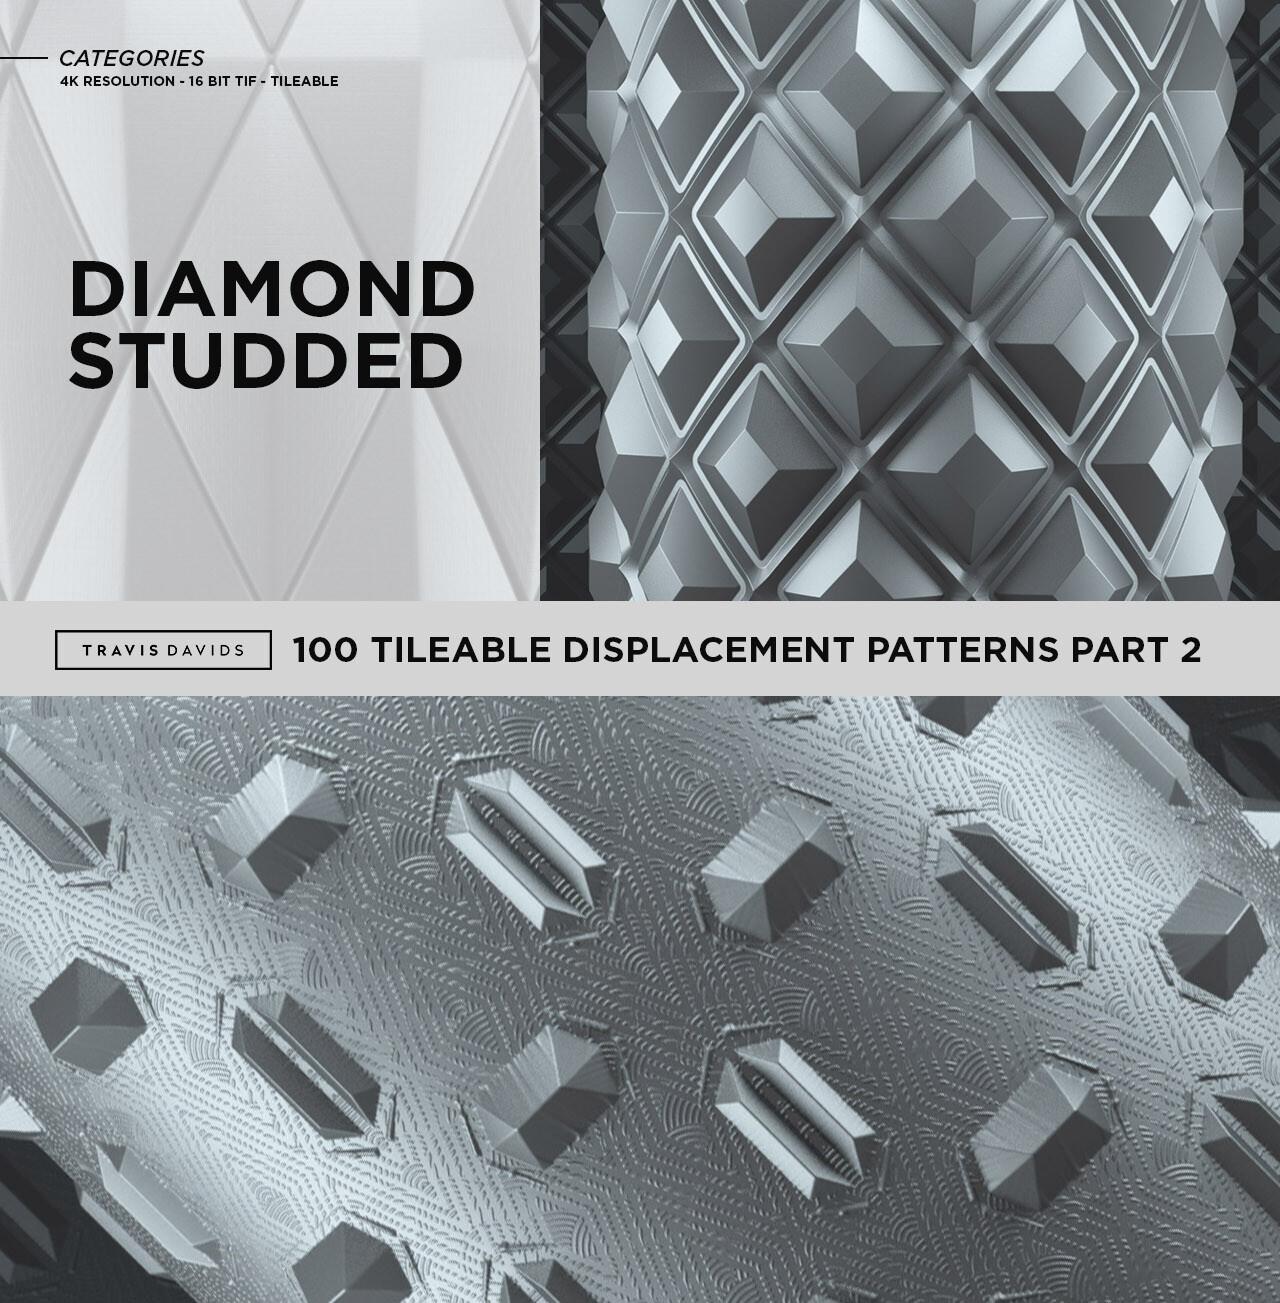 Travis davids categories diamond studded